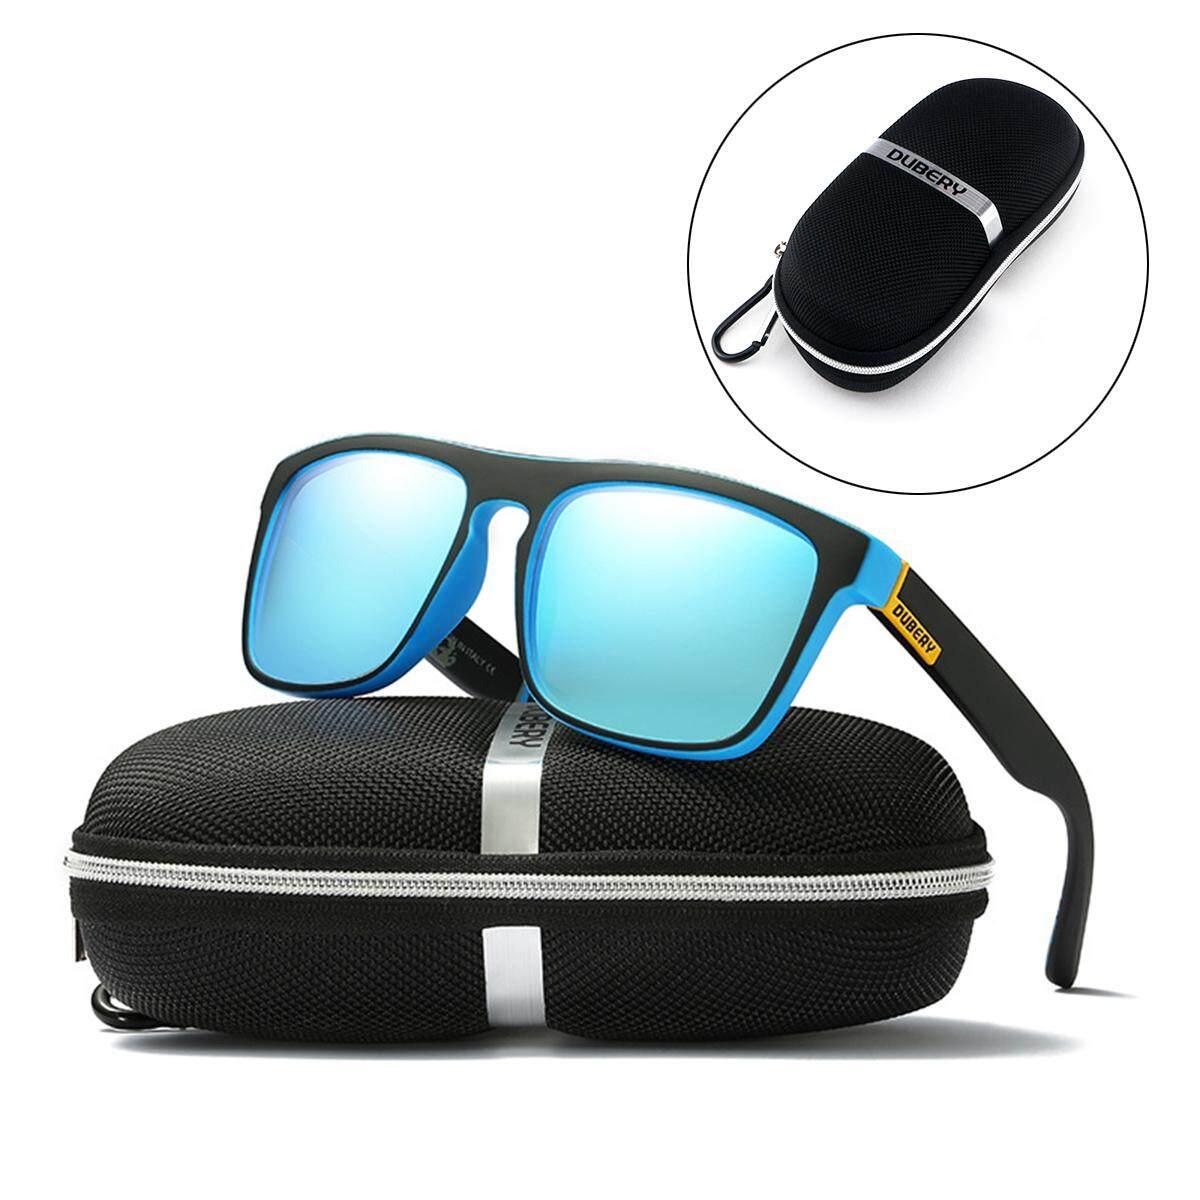 cbdc1a6572 DUBERY Sunglasses Box Glasses Zipper Case Bag Pouch w  Cloth Polarized Test  Card - intl